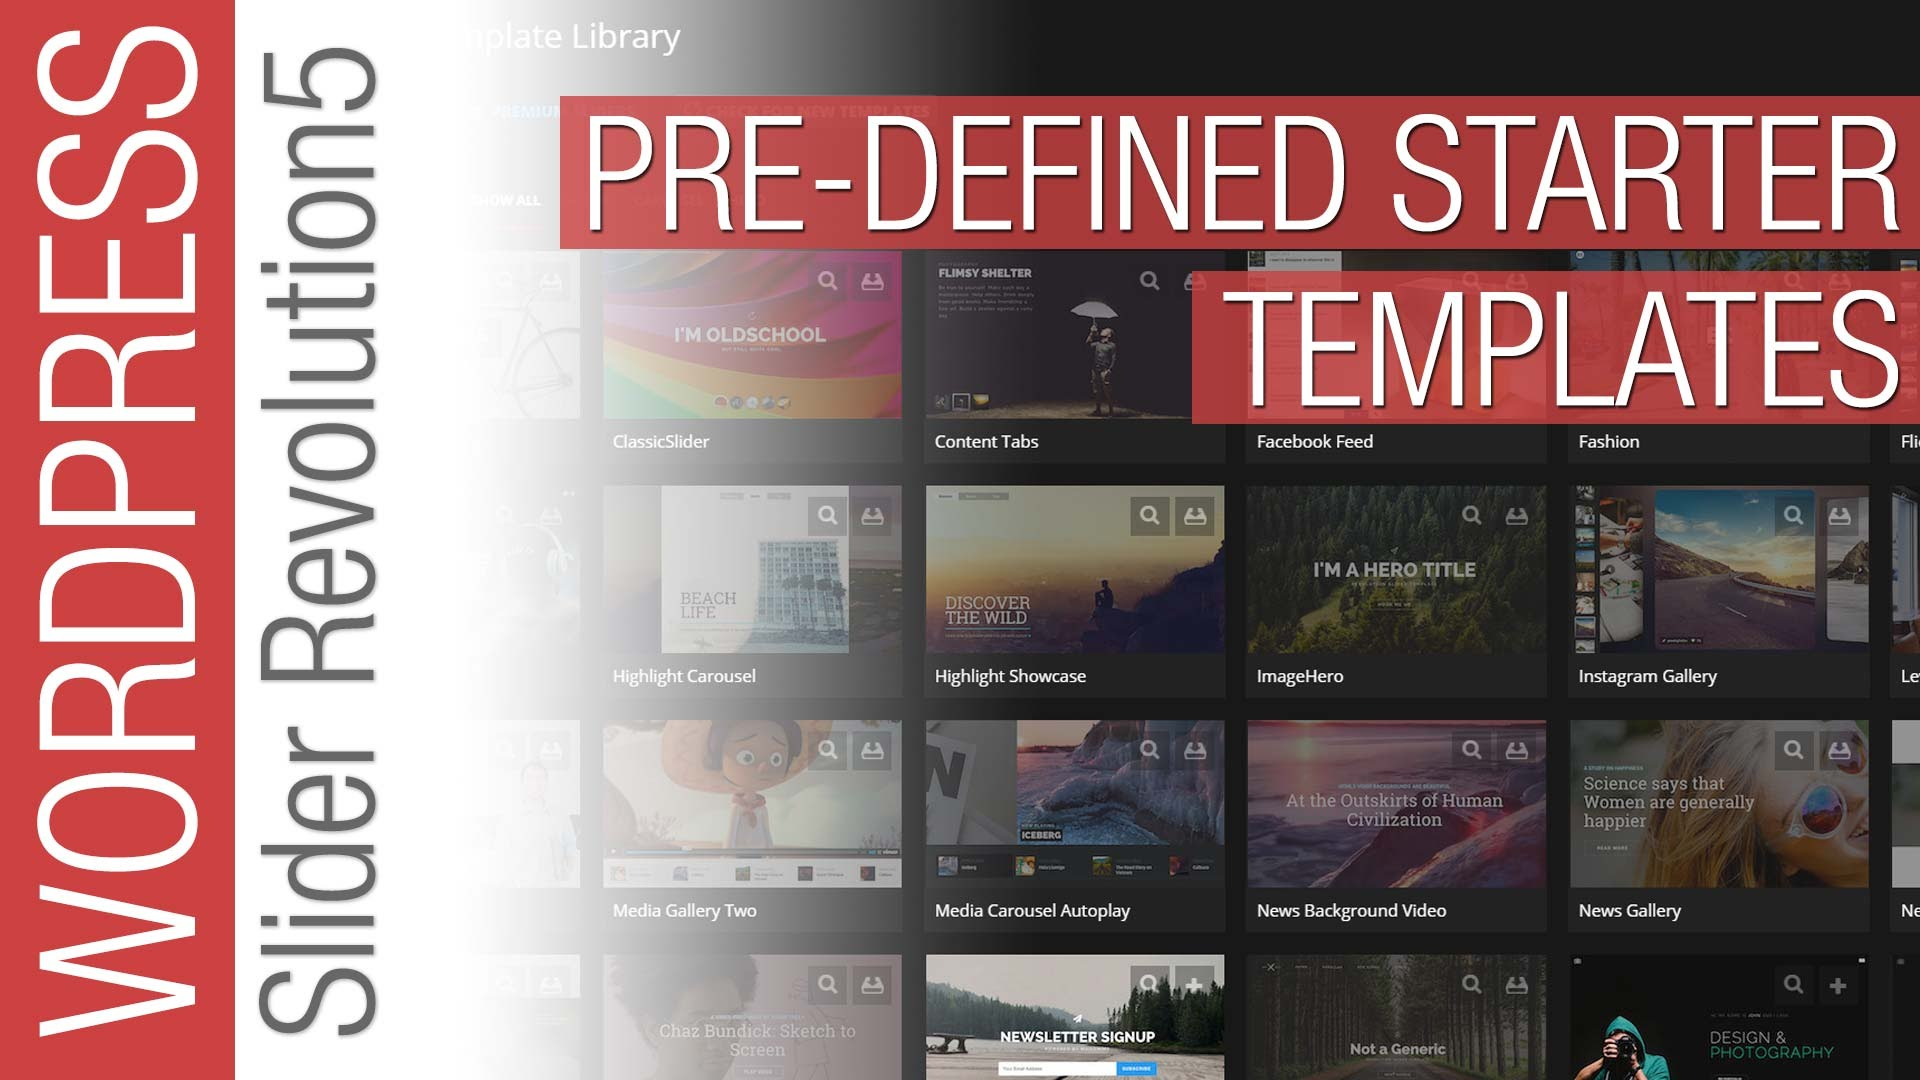 Slider Revolution 5 for WordPress – Pre-Defined templates